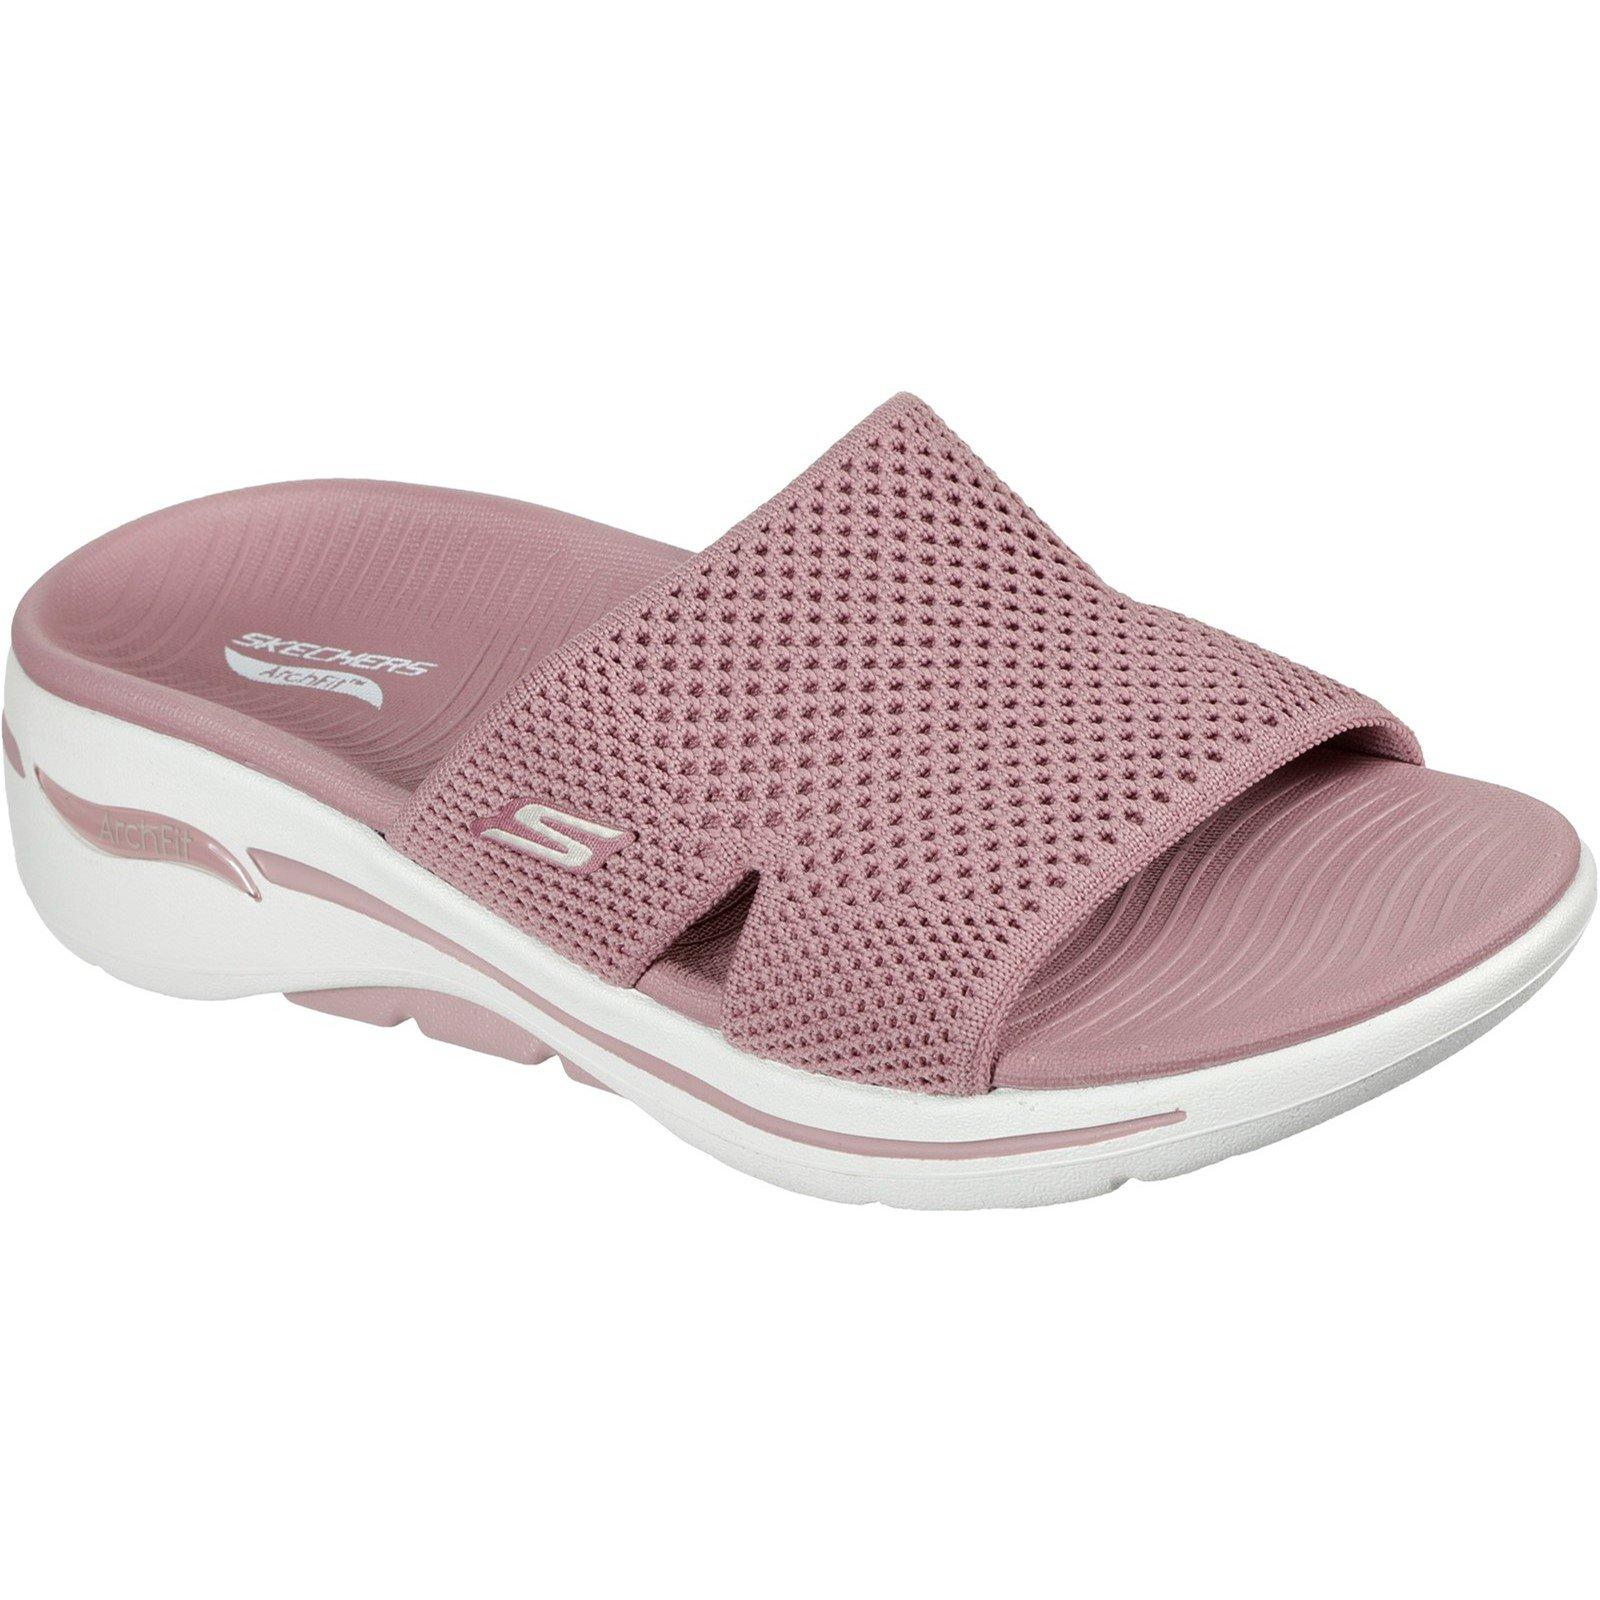 Skechers Women's Go Walk Arch Fit Worthy Summer Sandal Various Colours 32152 - Rose 4